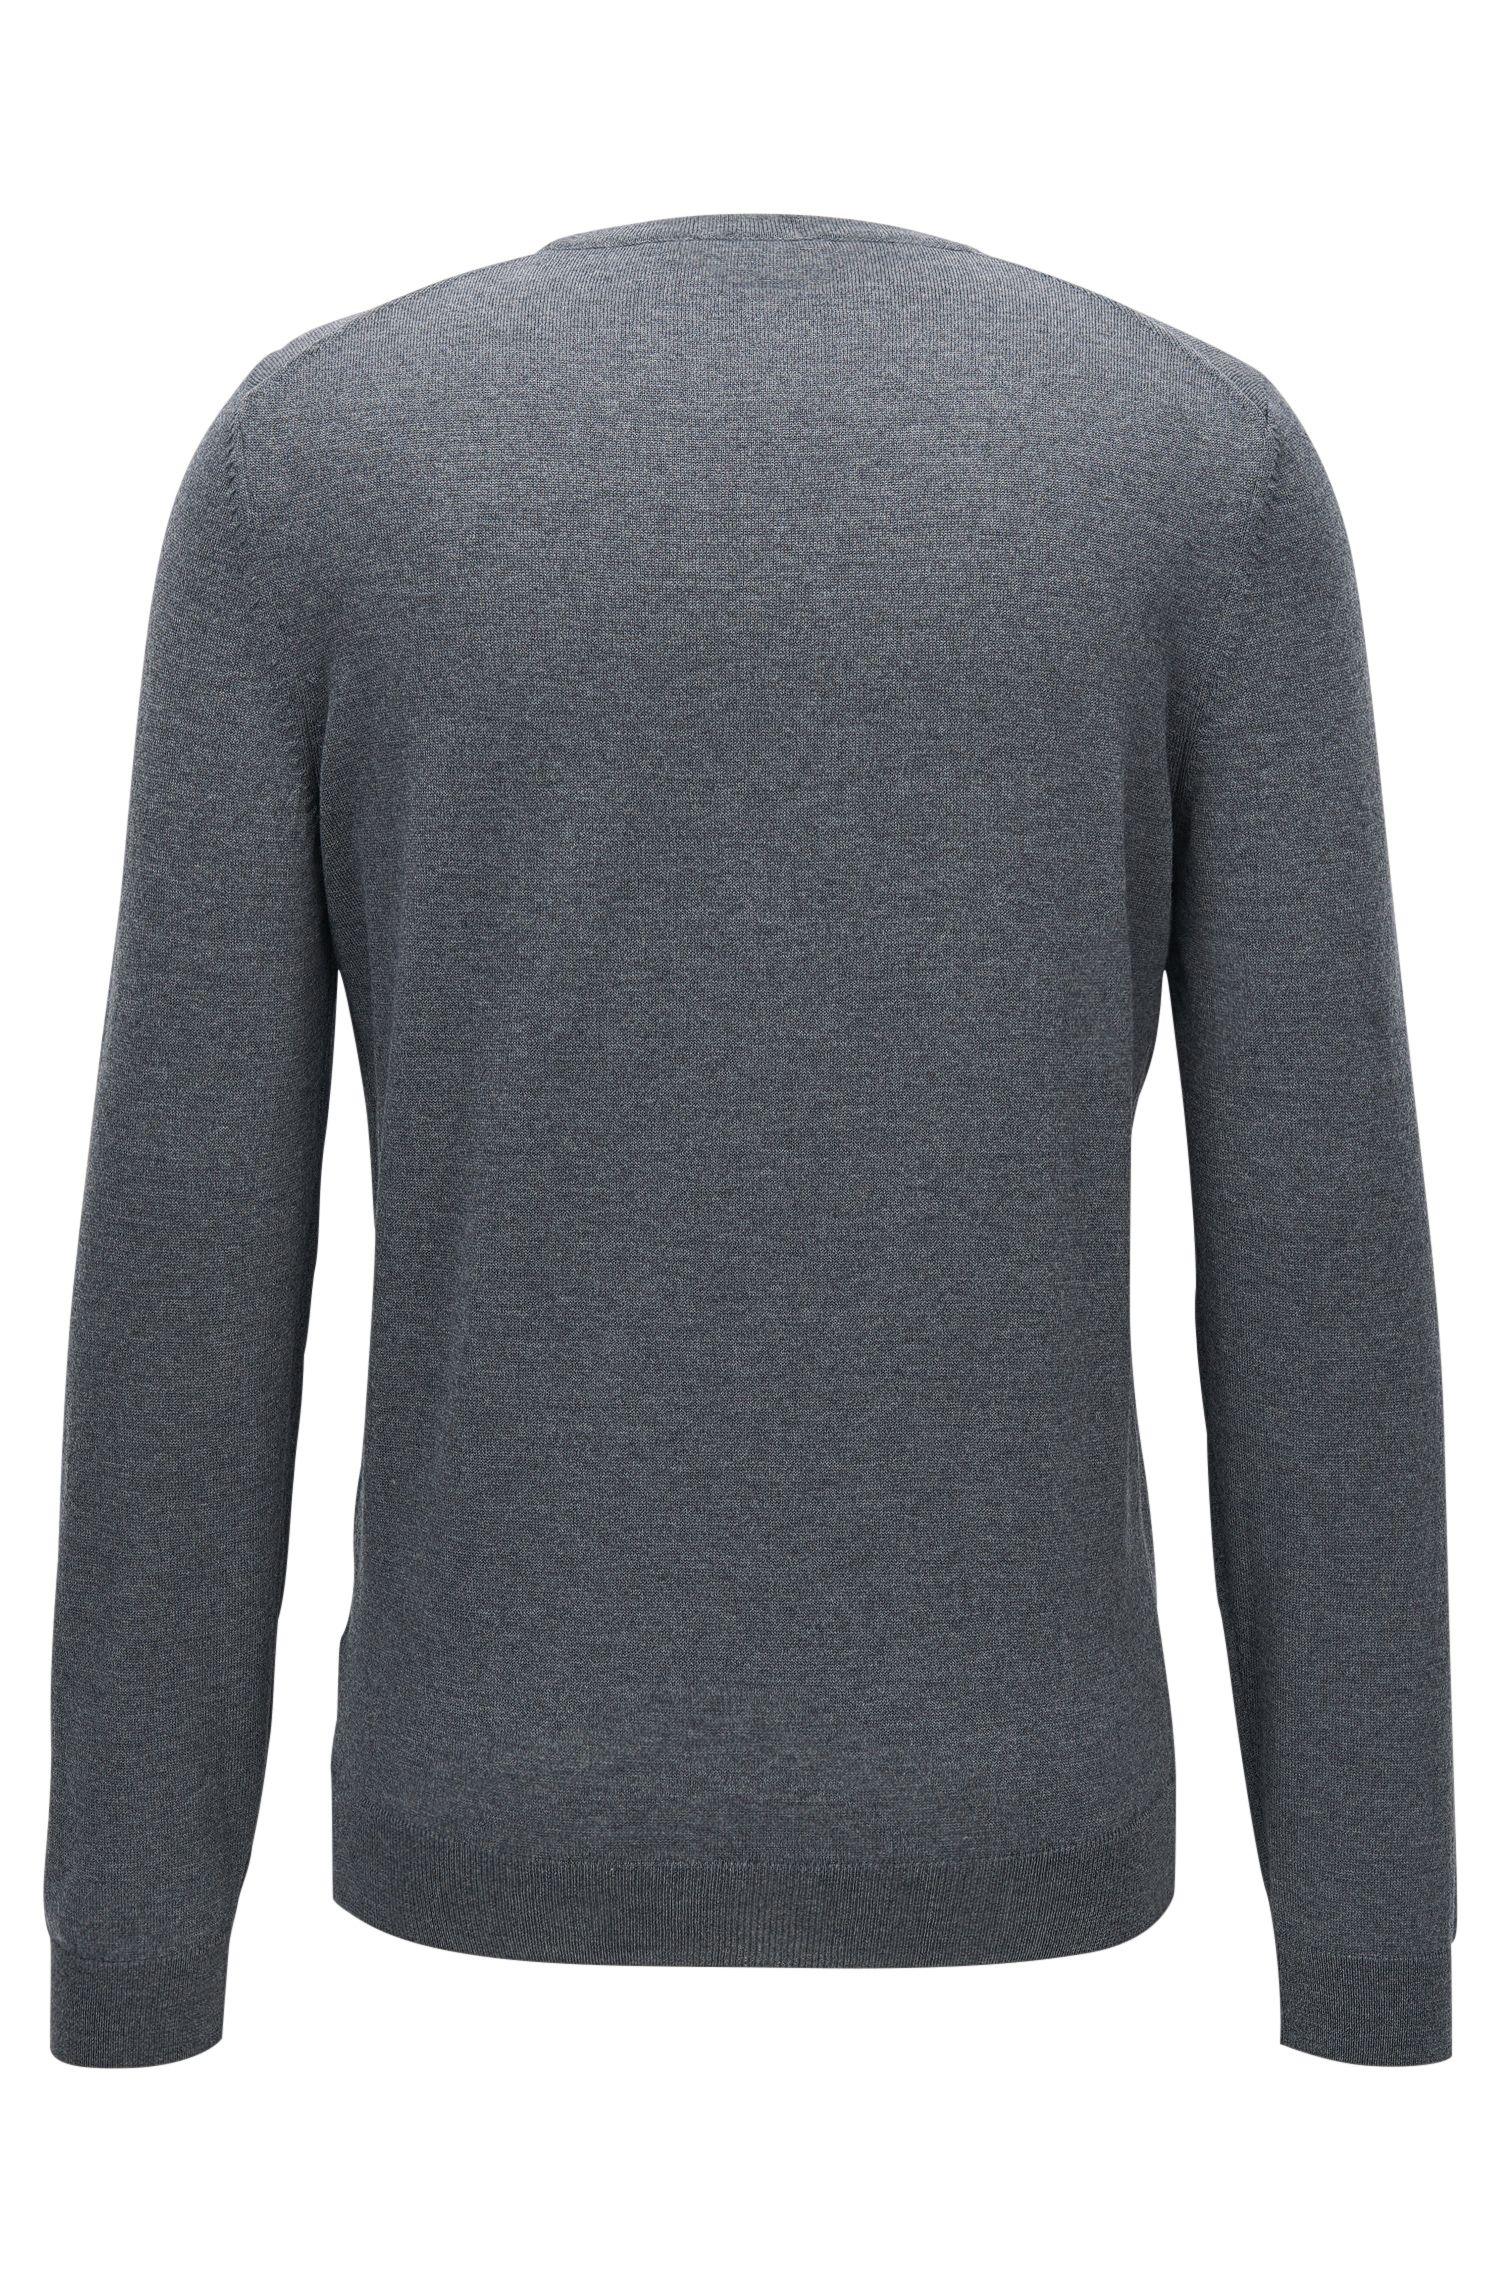 V-neck sweater in virgin wool, Grey